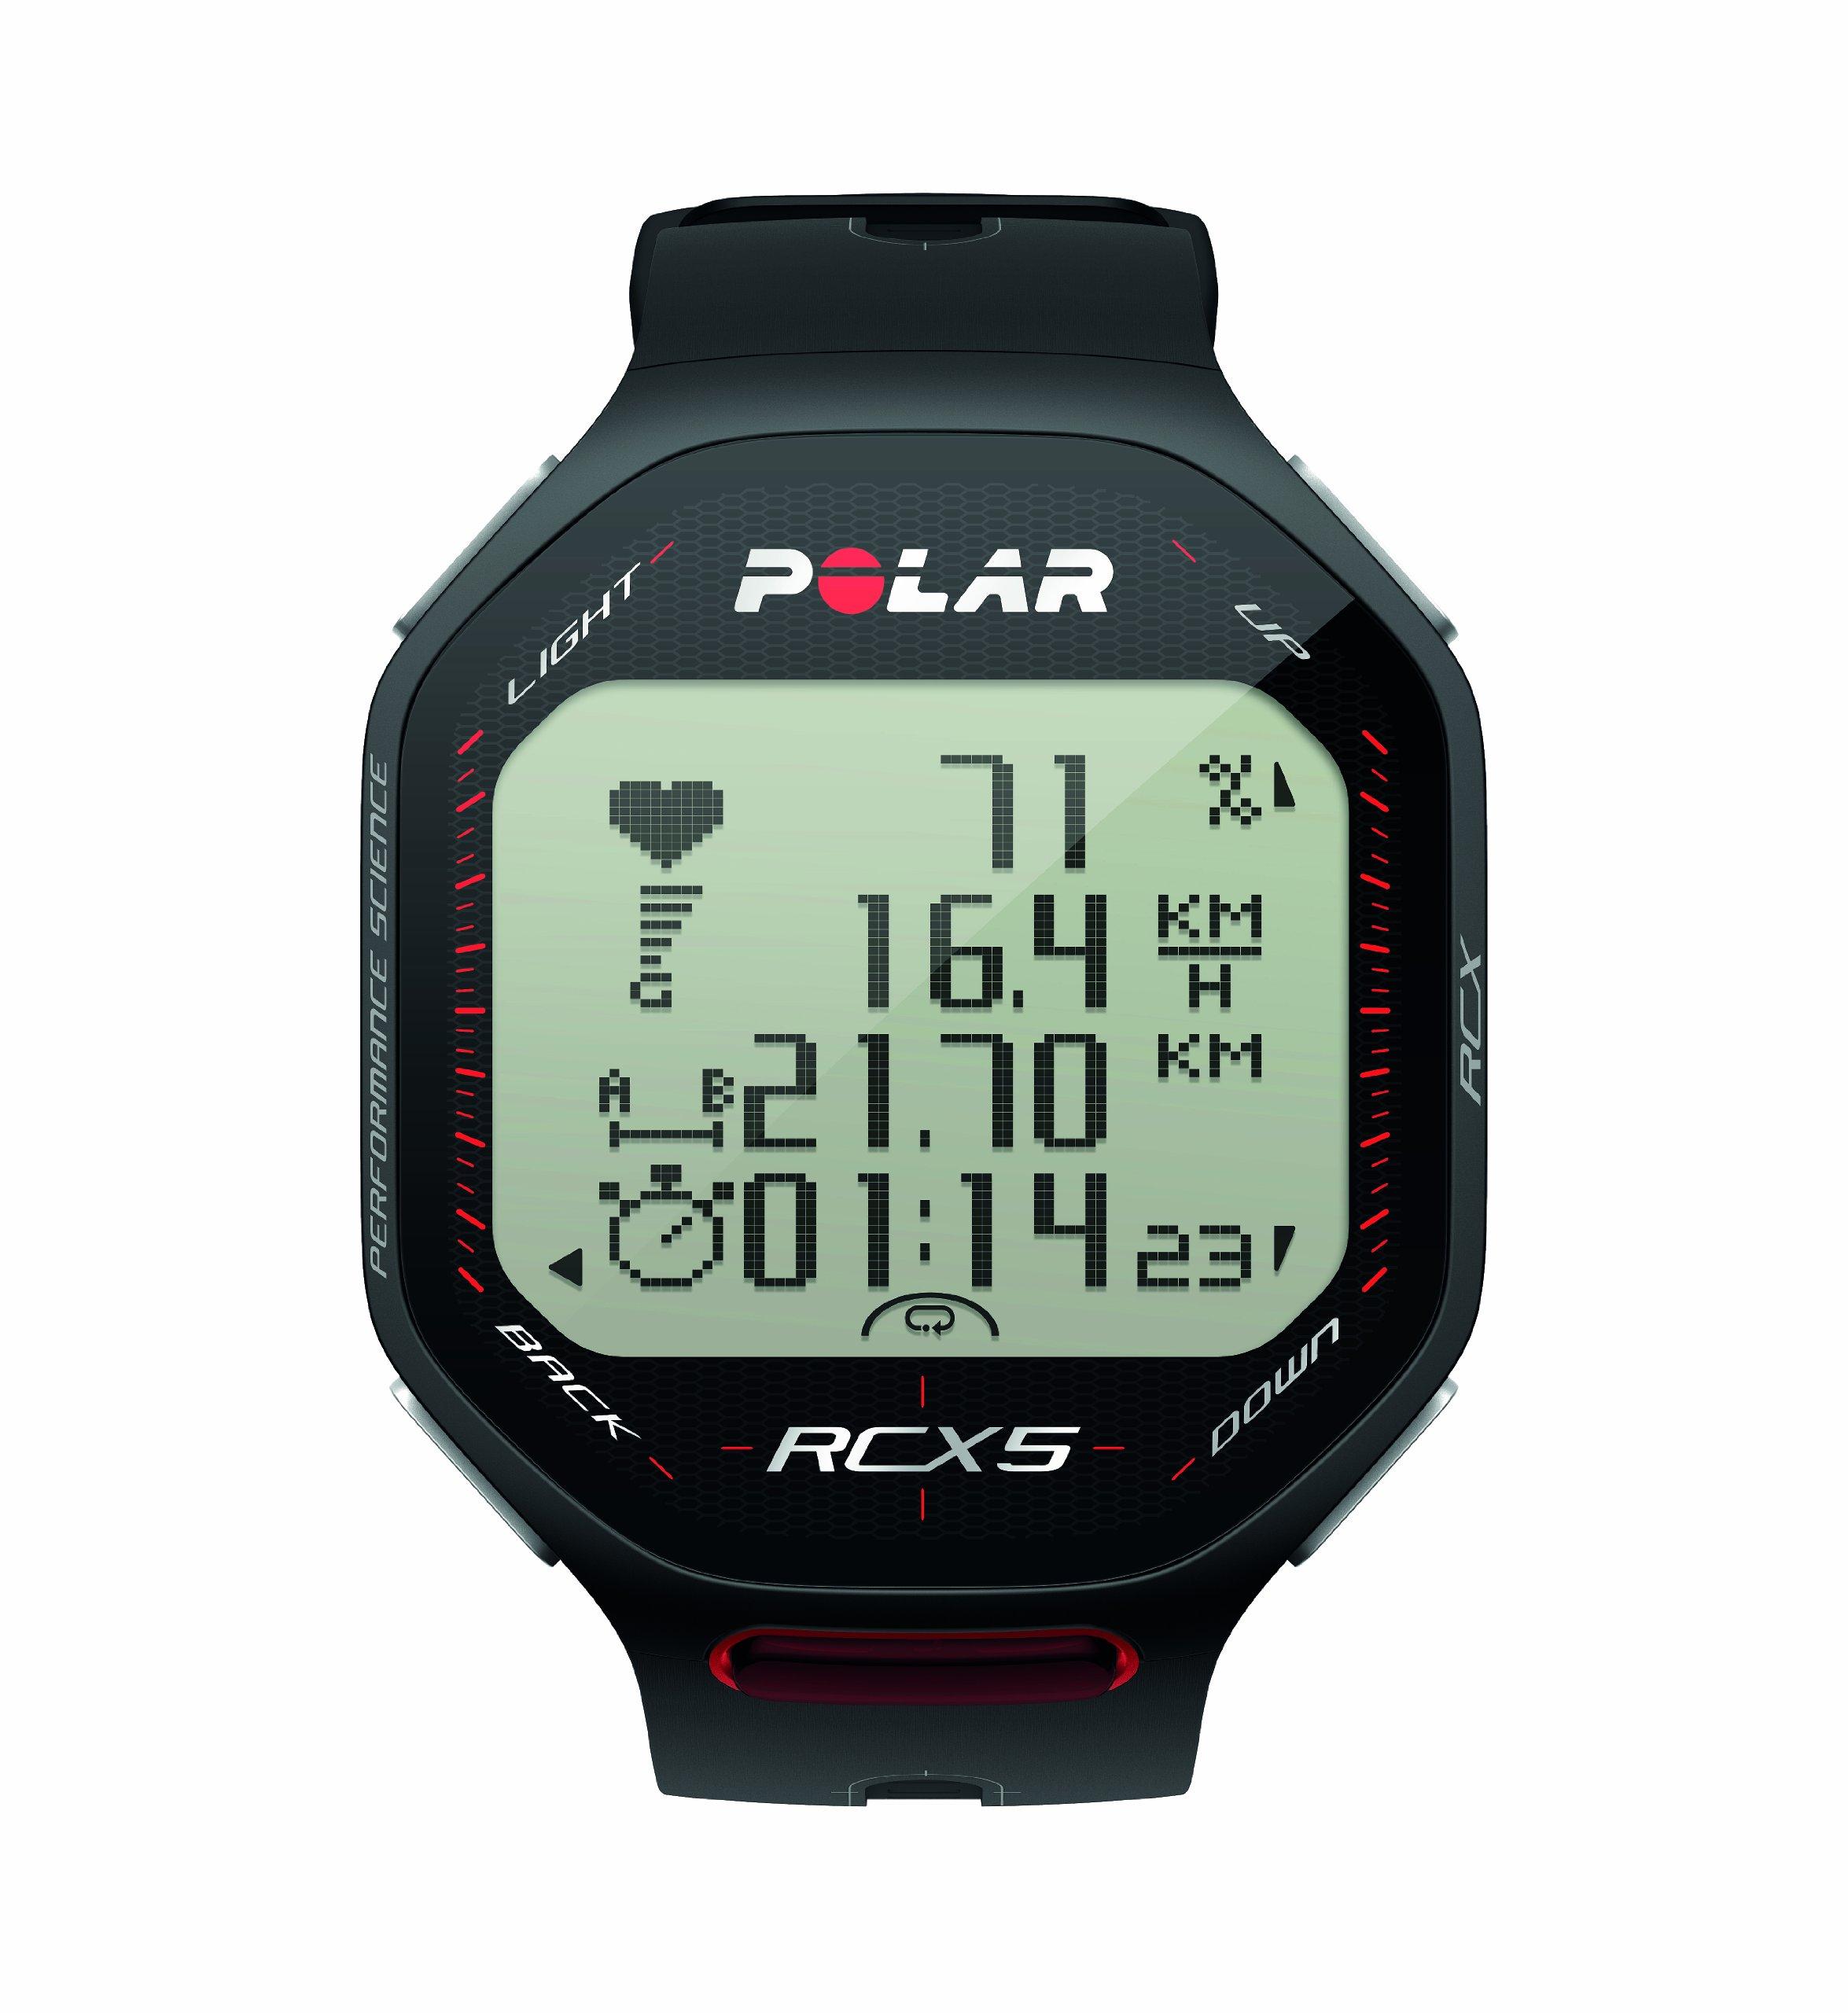 Polar Bike computer with heart monitor RCX5 GPS black